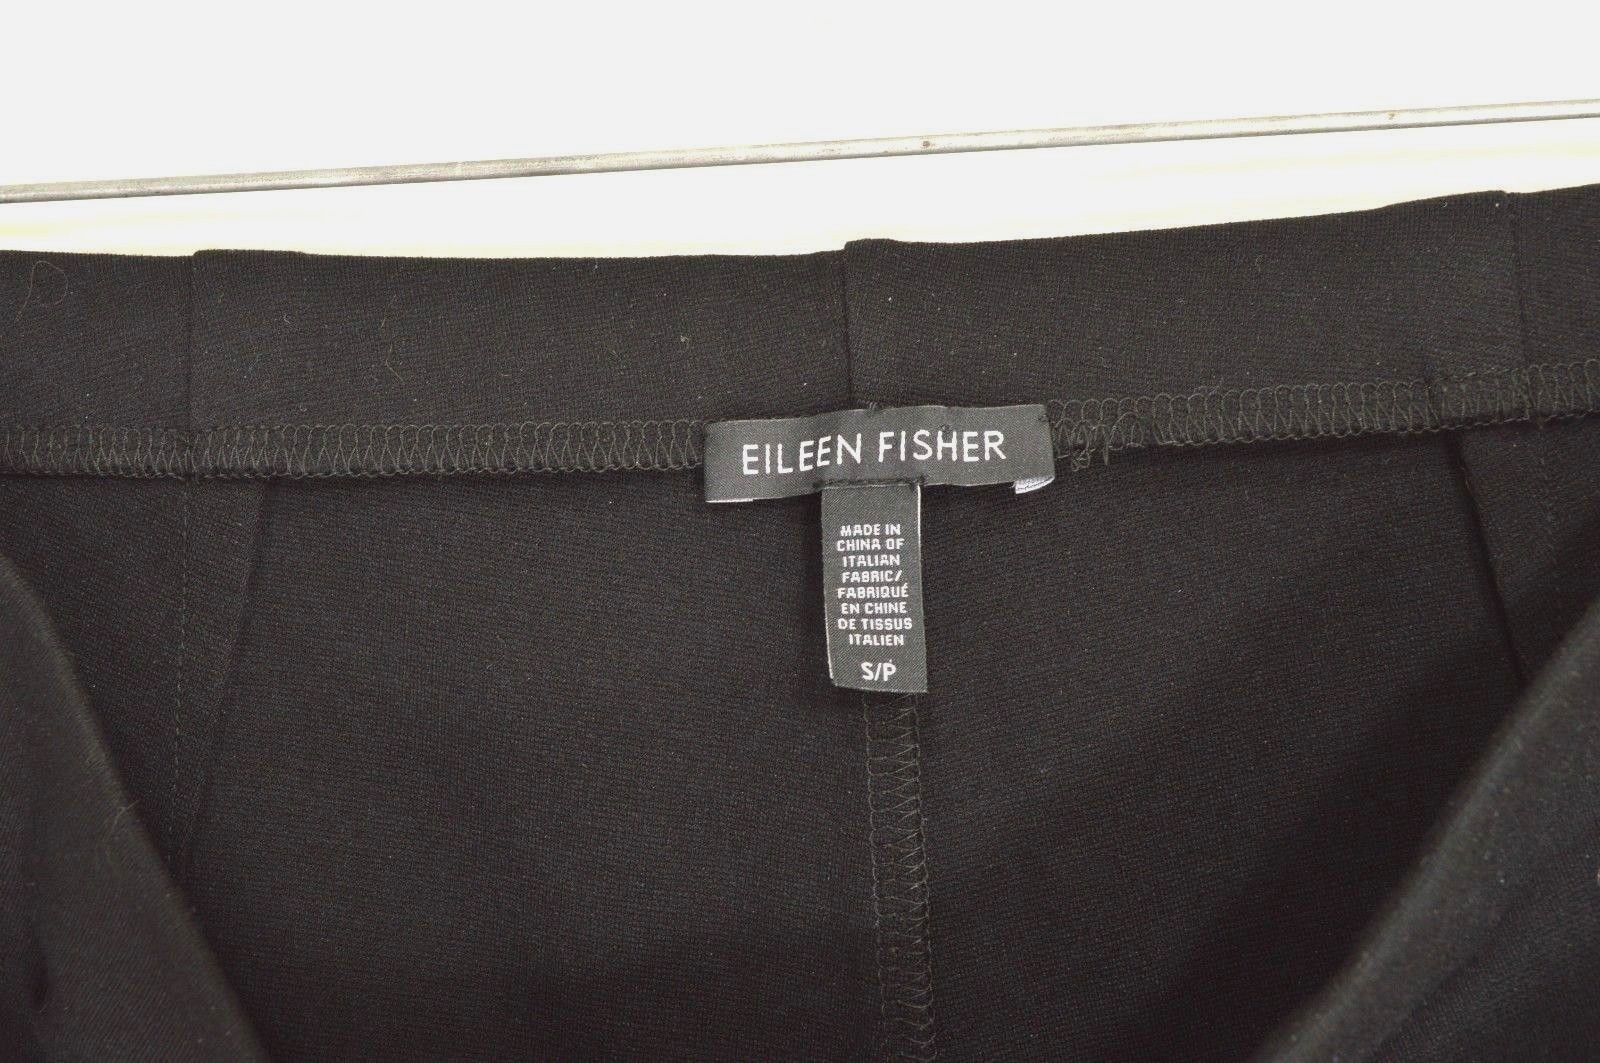 Eileen Fisher leggings S x 32 black smooth viscose blend skinny